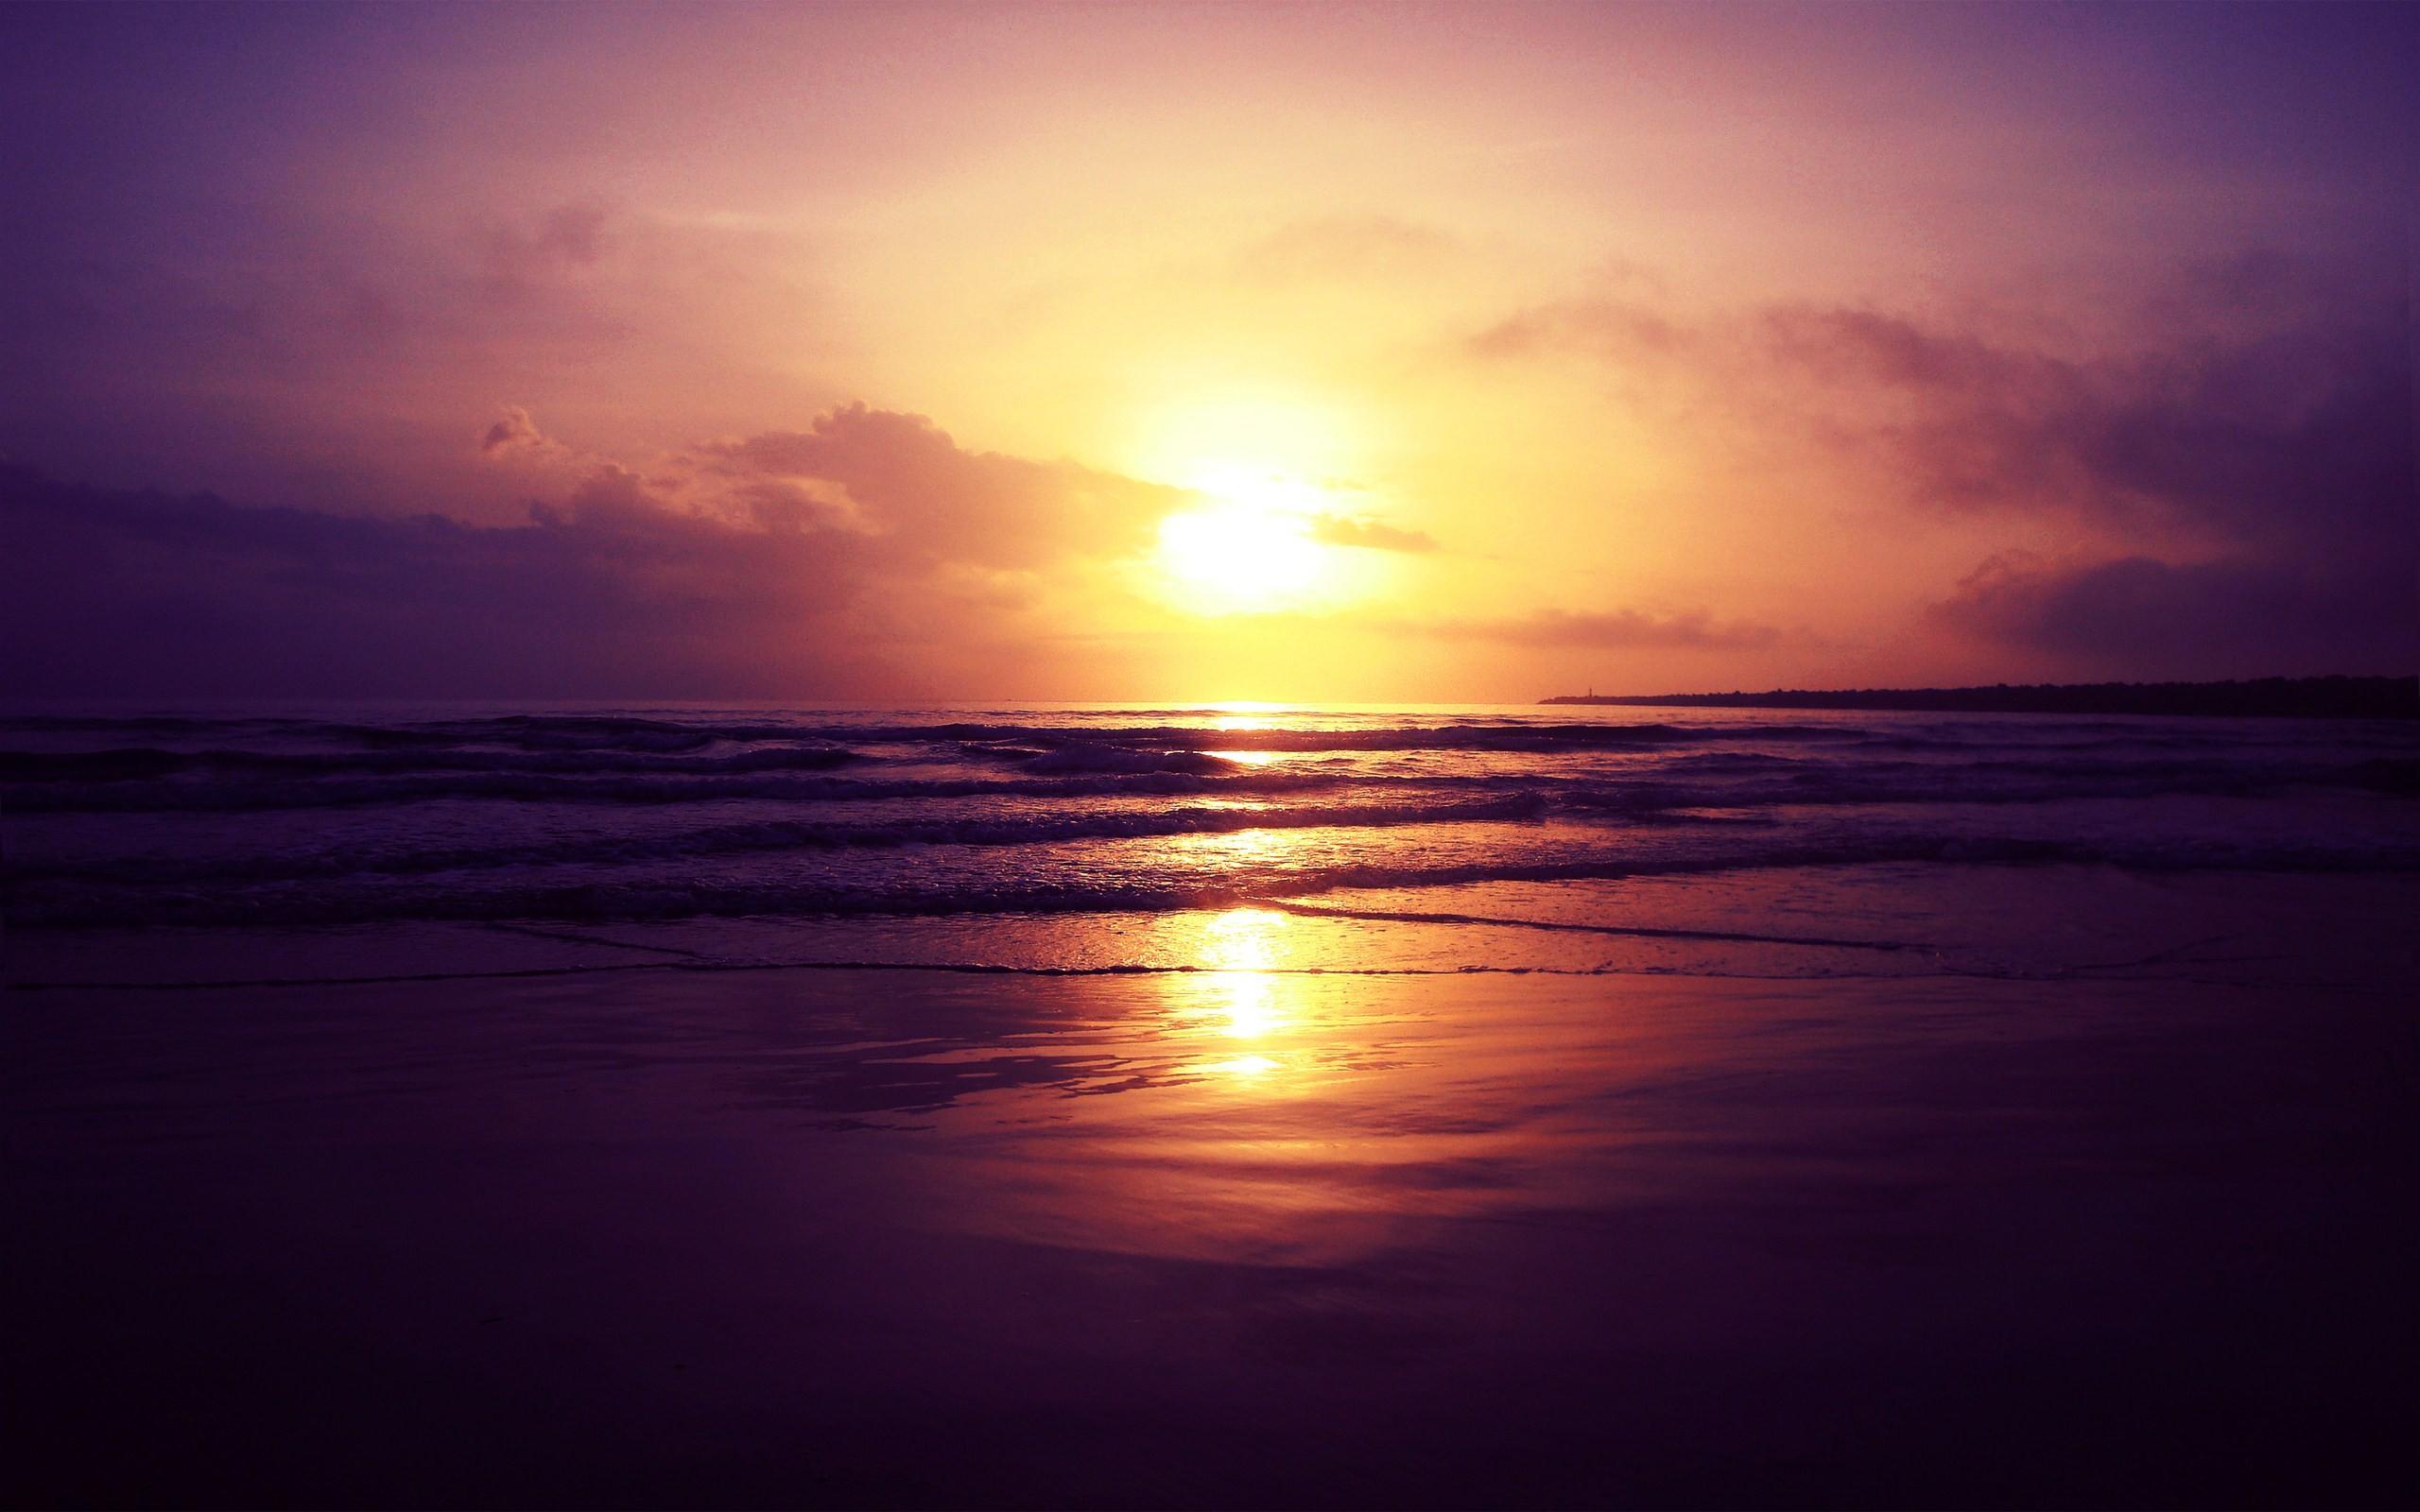 General 2560x1600 sunset landscape nature beach waves sea coast reflection